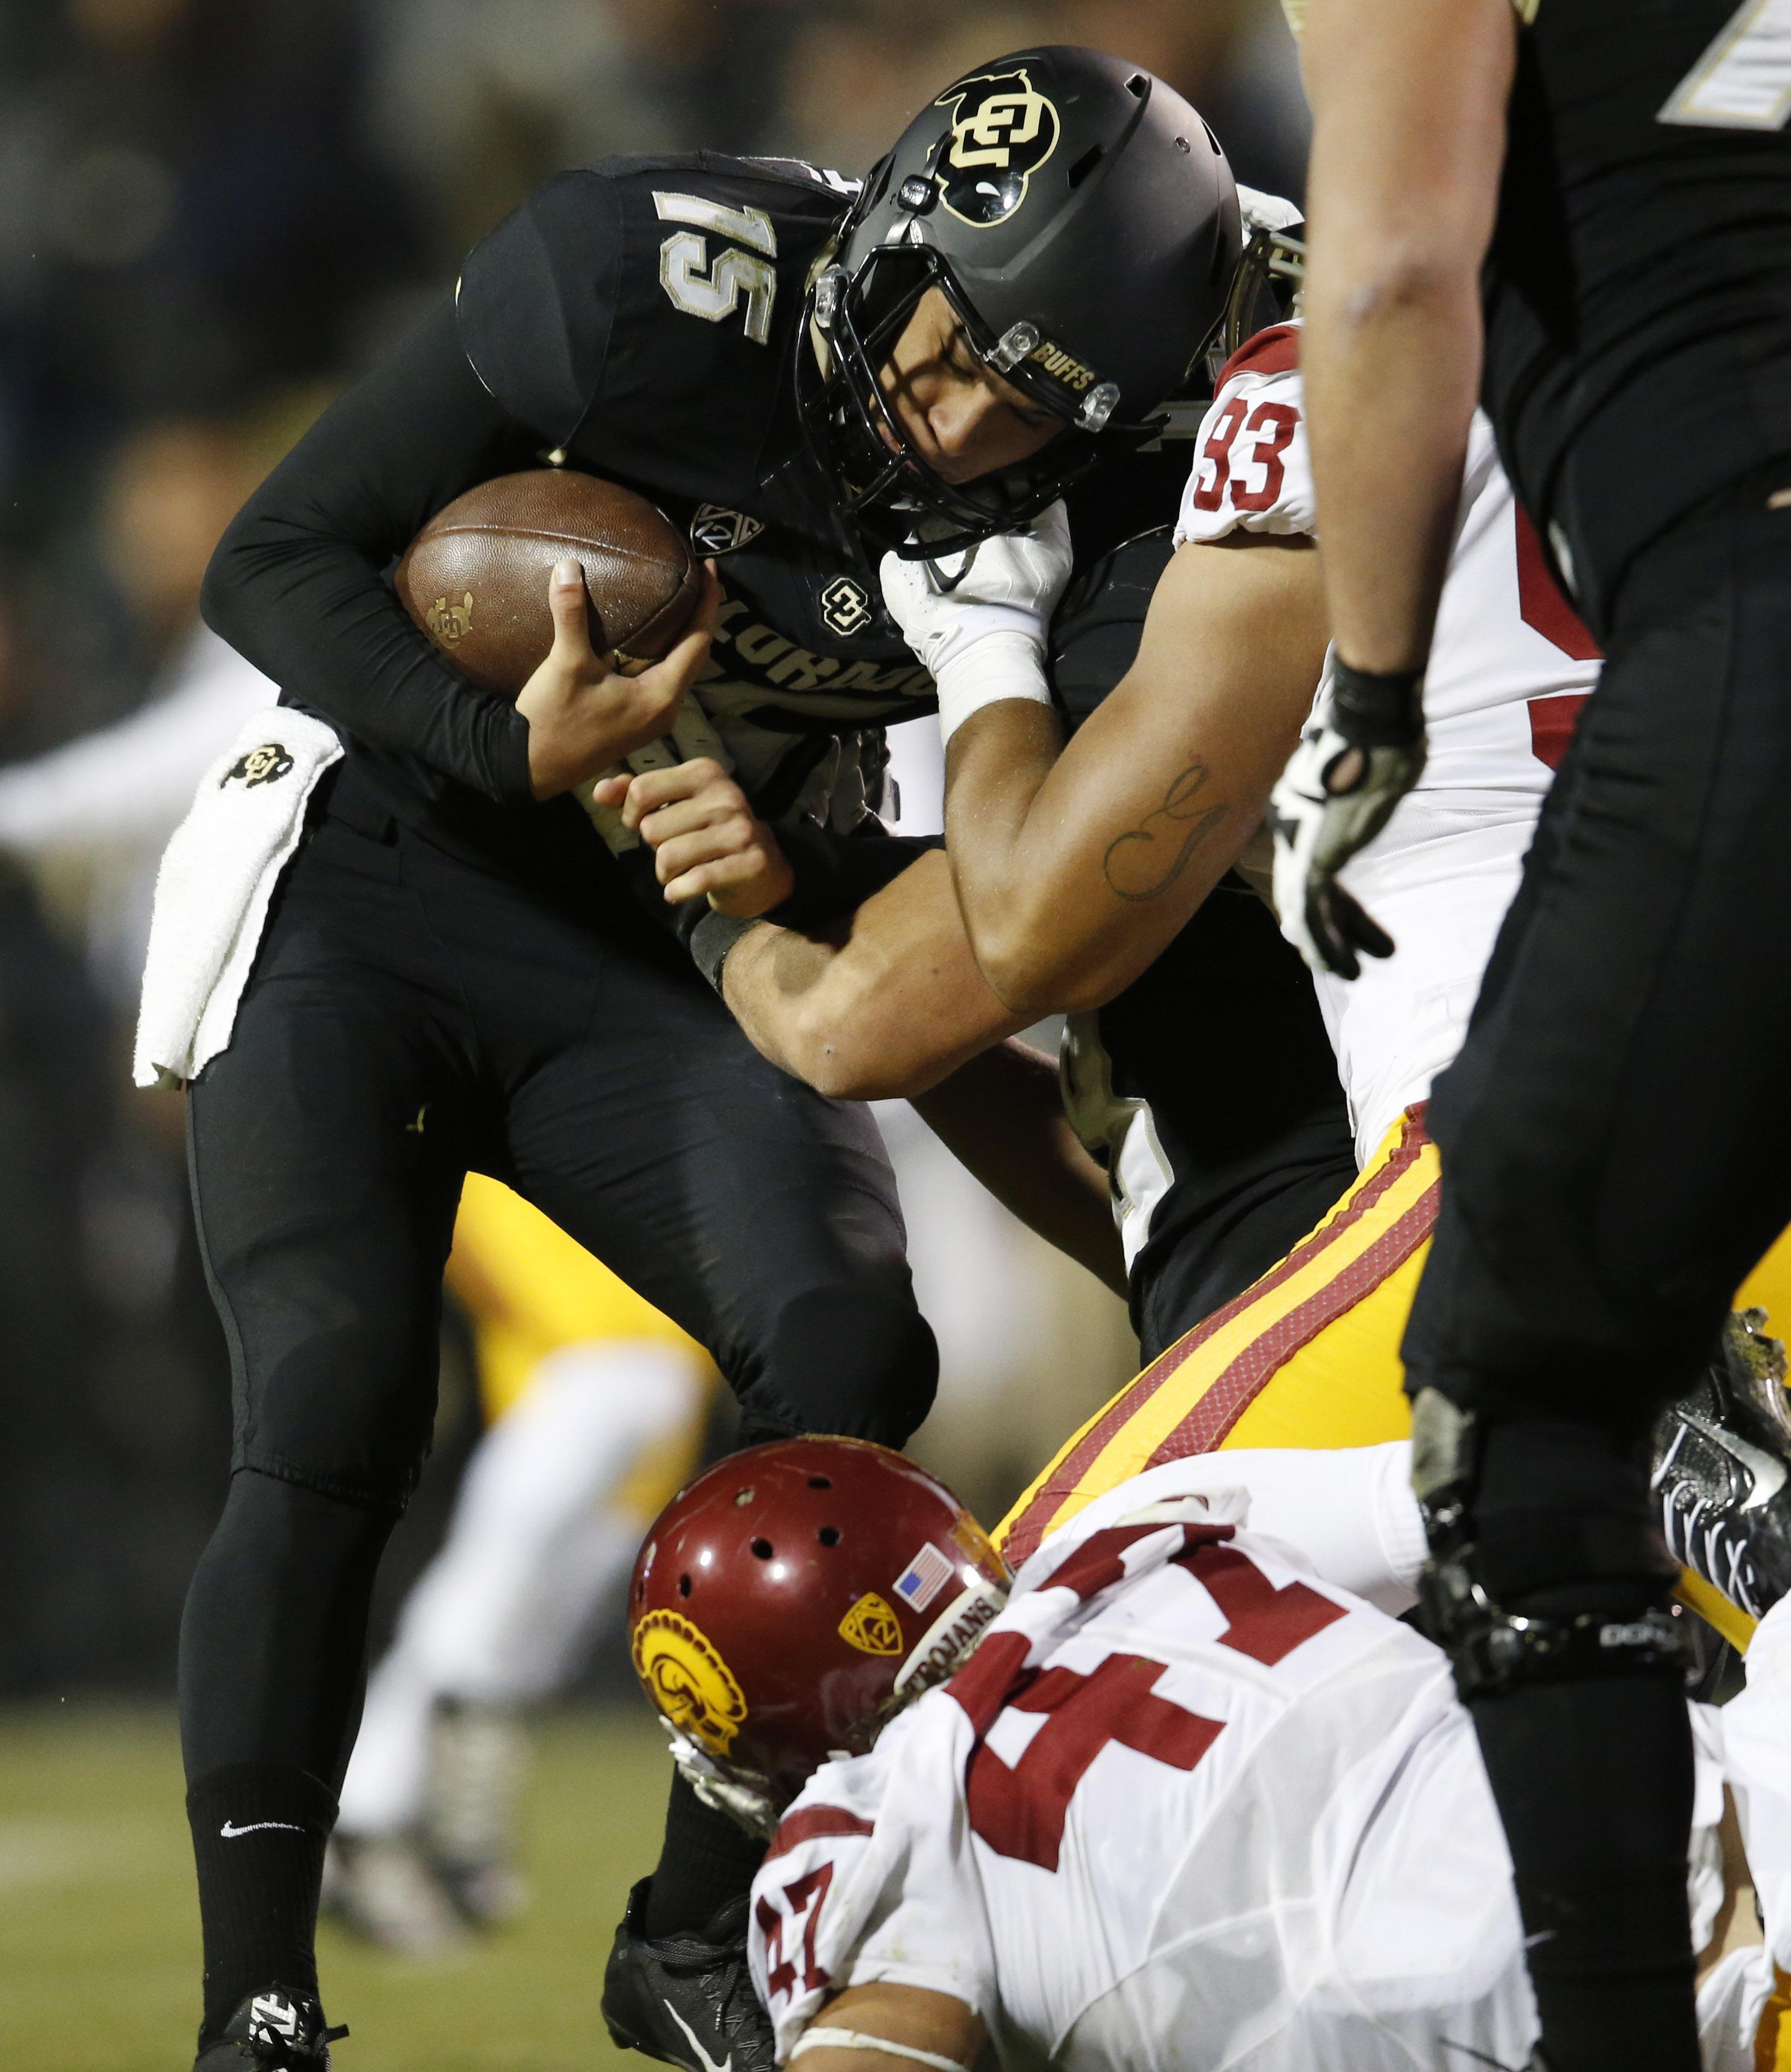 Buffaloes' Redshirt Freshman Quarterback Cade Apsay A